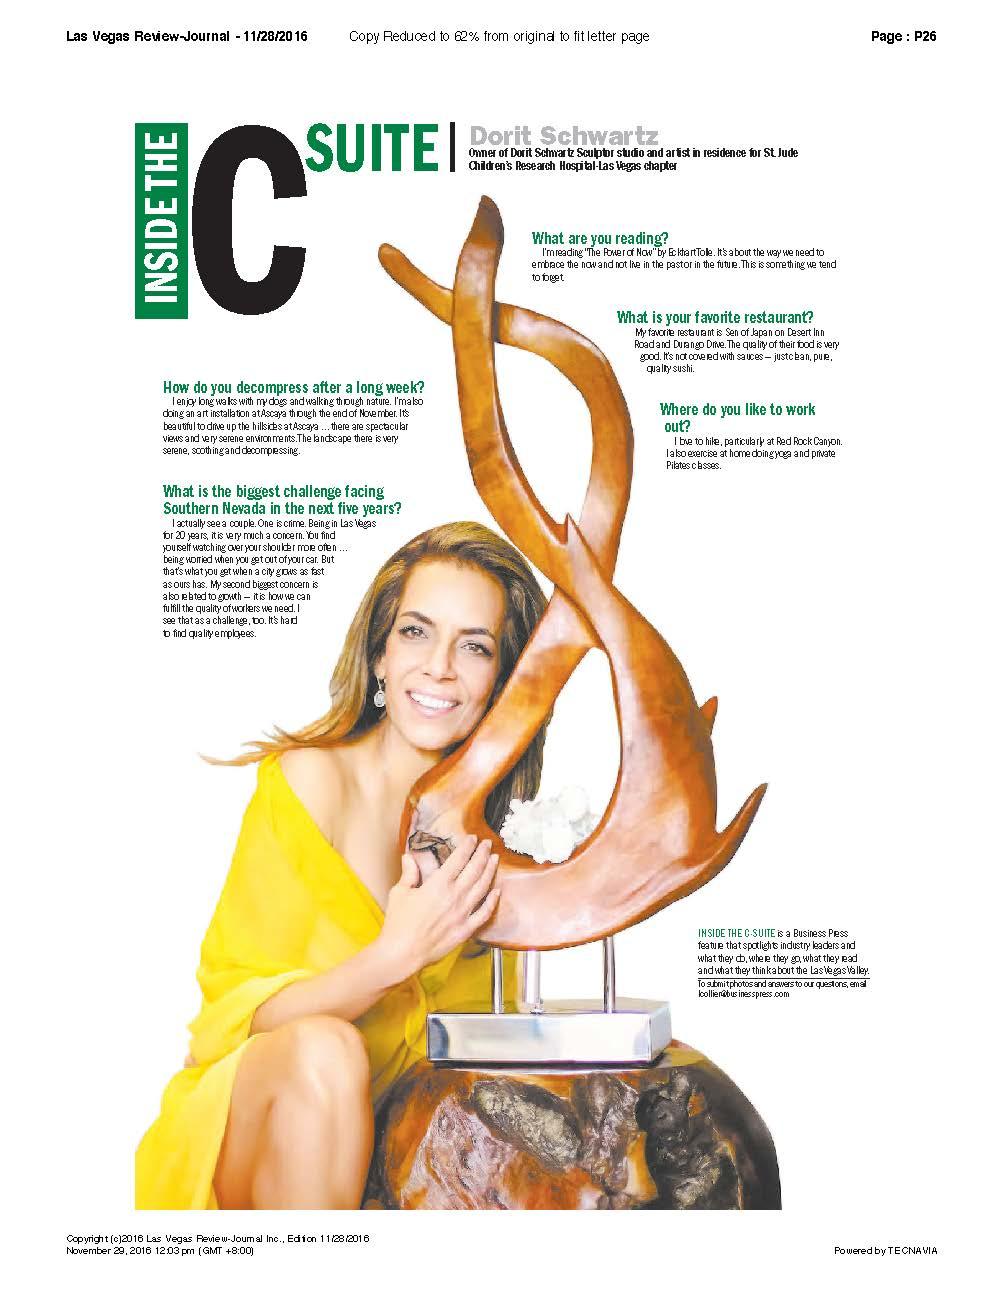 CSuite - Dorit Schwartz in the Las Vegas Review Journal